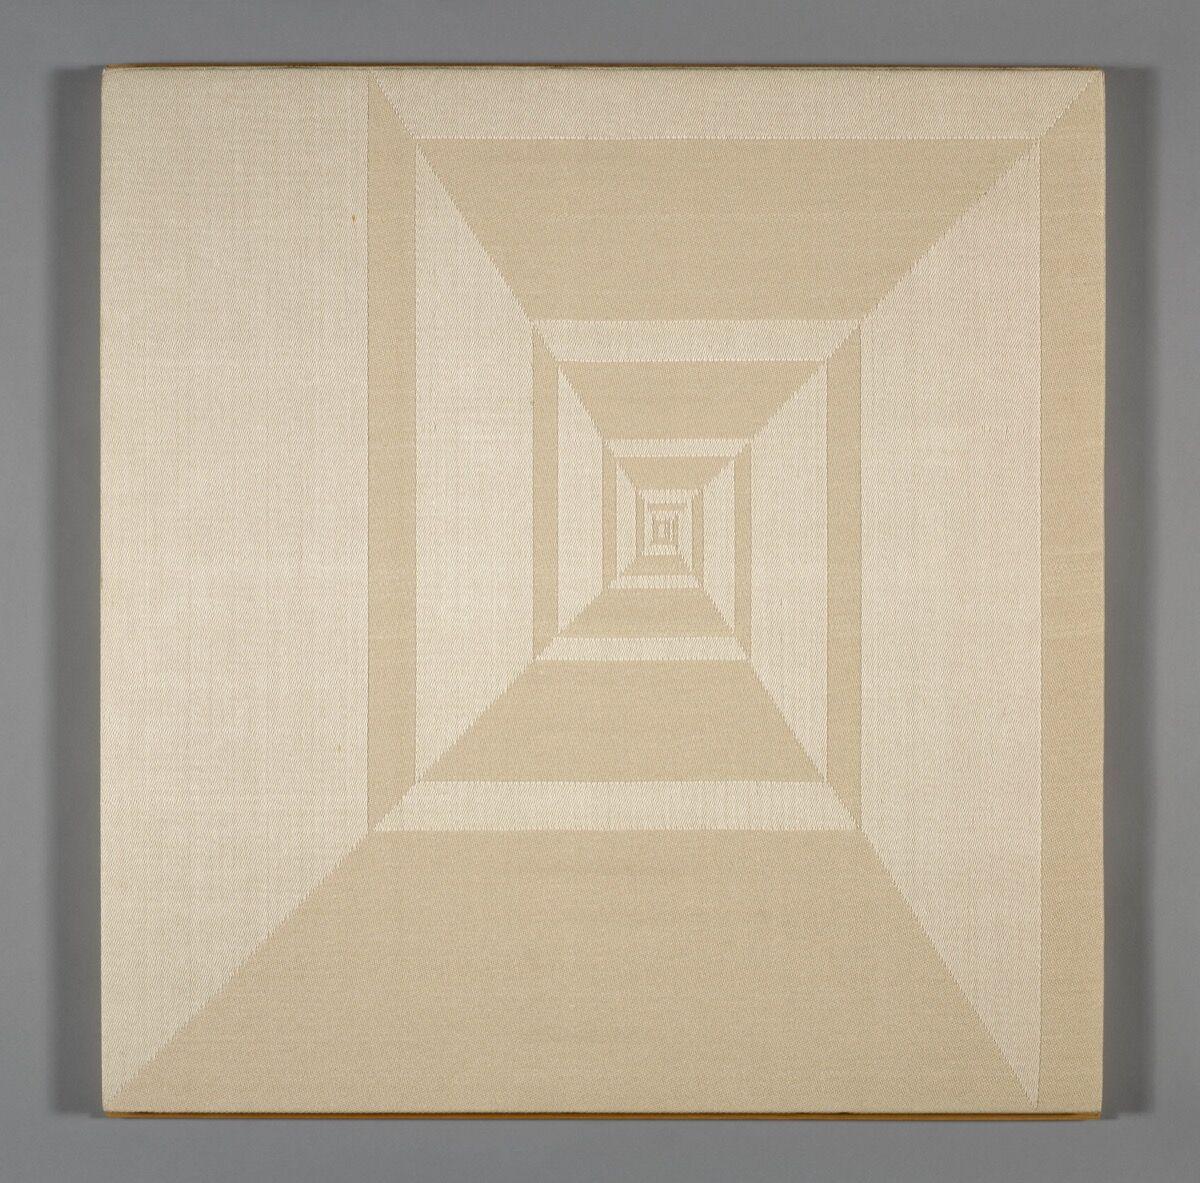 Ethel Stein, White Pinwheel, 1990. © Ethel Stein. Courtesy of the Art Institute of Chicago.